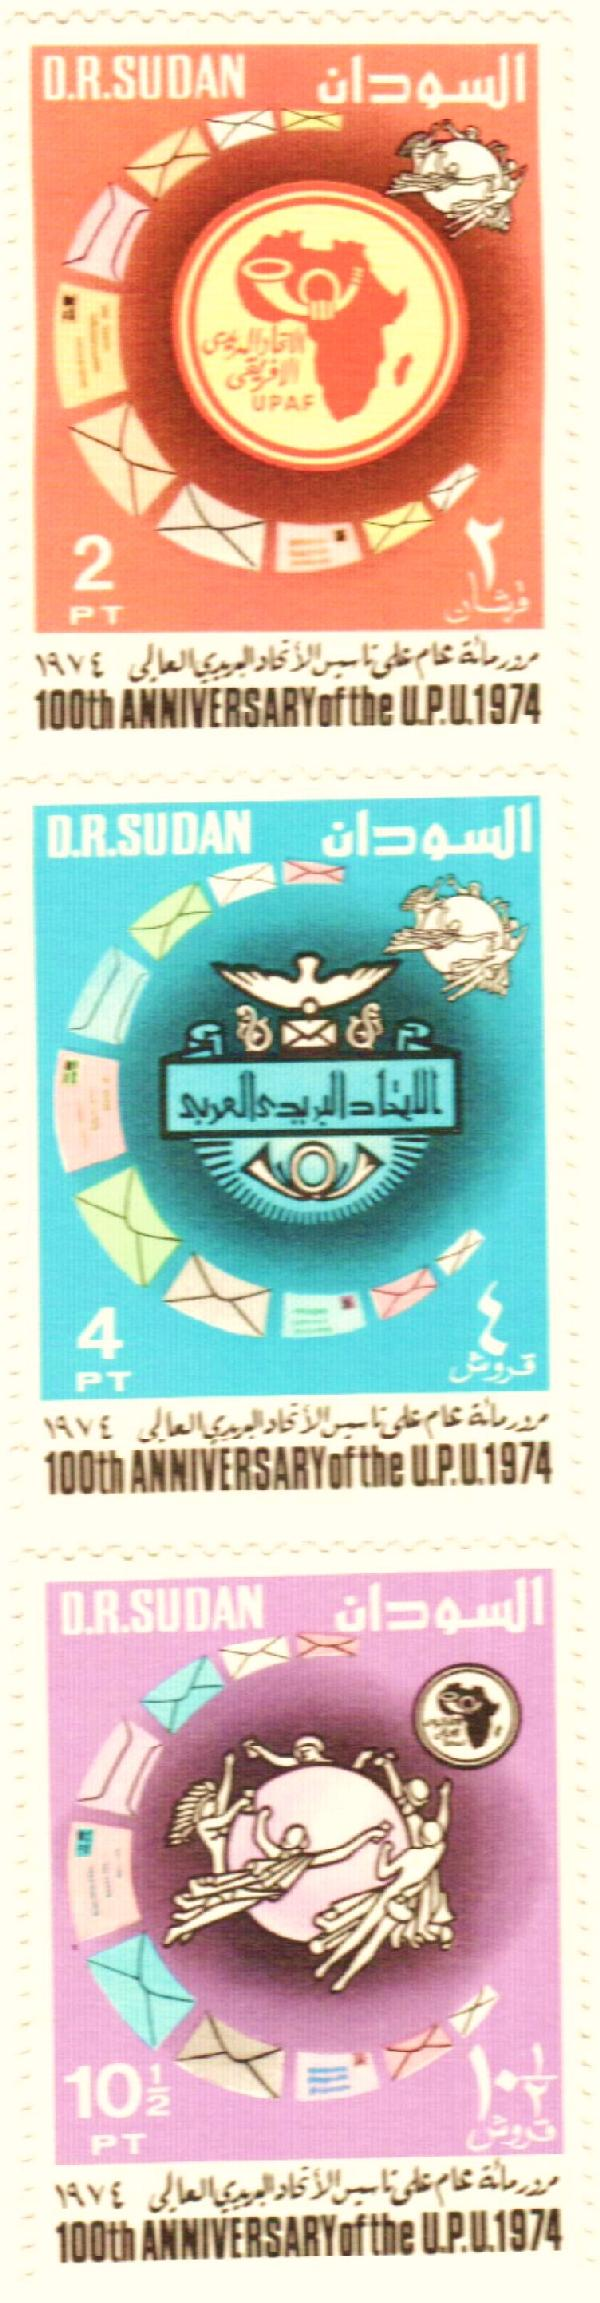 1974 Sudan